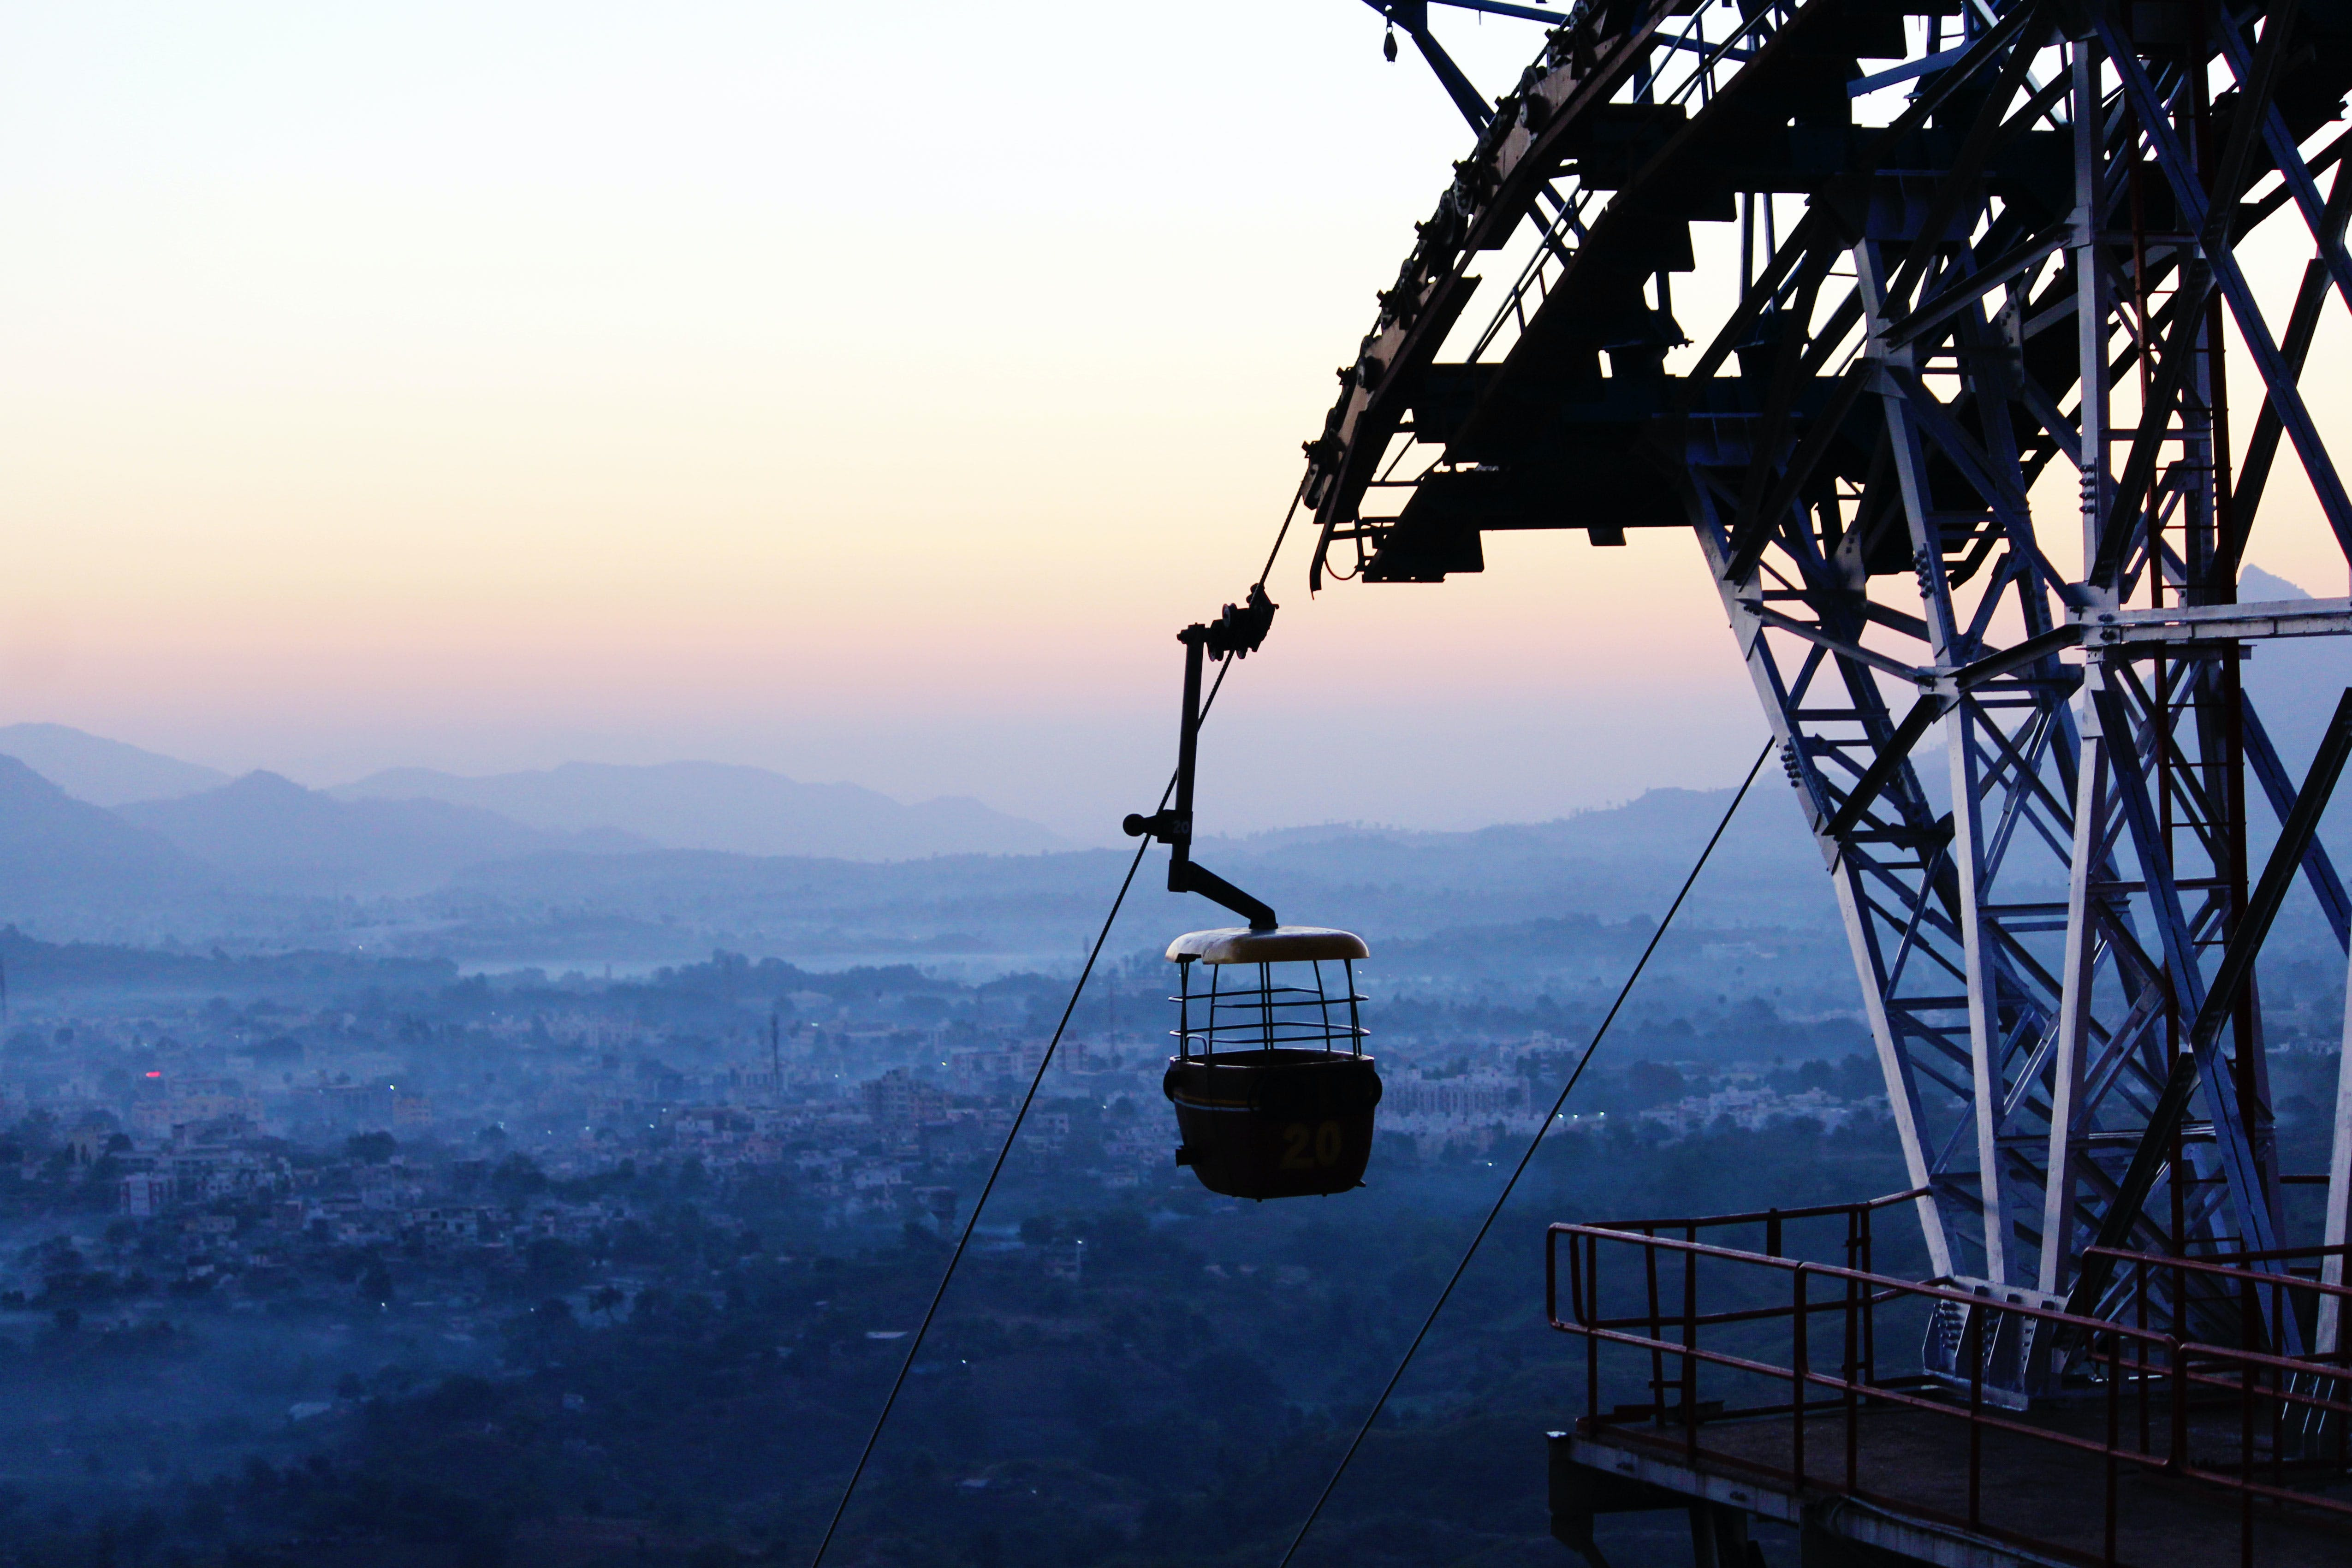 Kostenloses Stock Foto zu abendsonne, berge, blau, dunkel